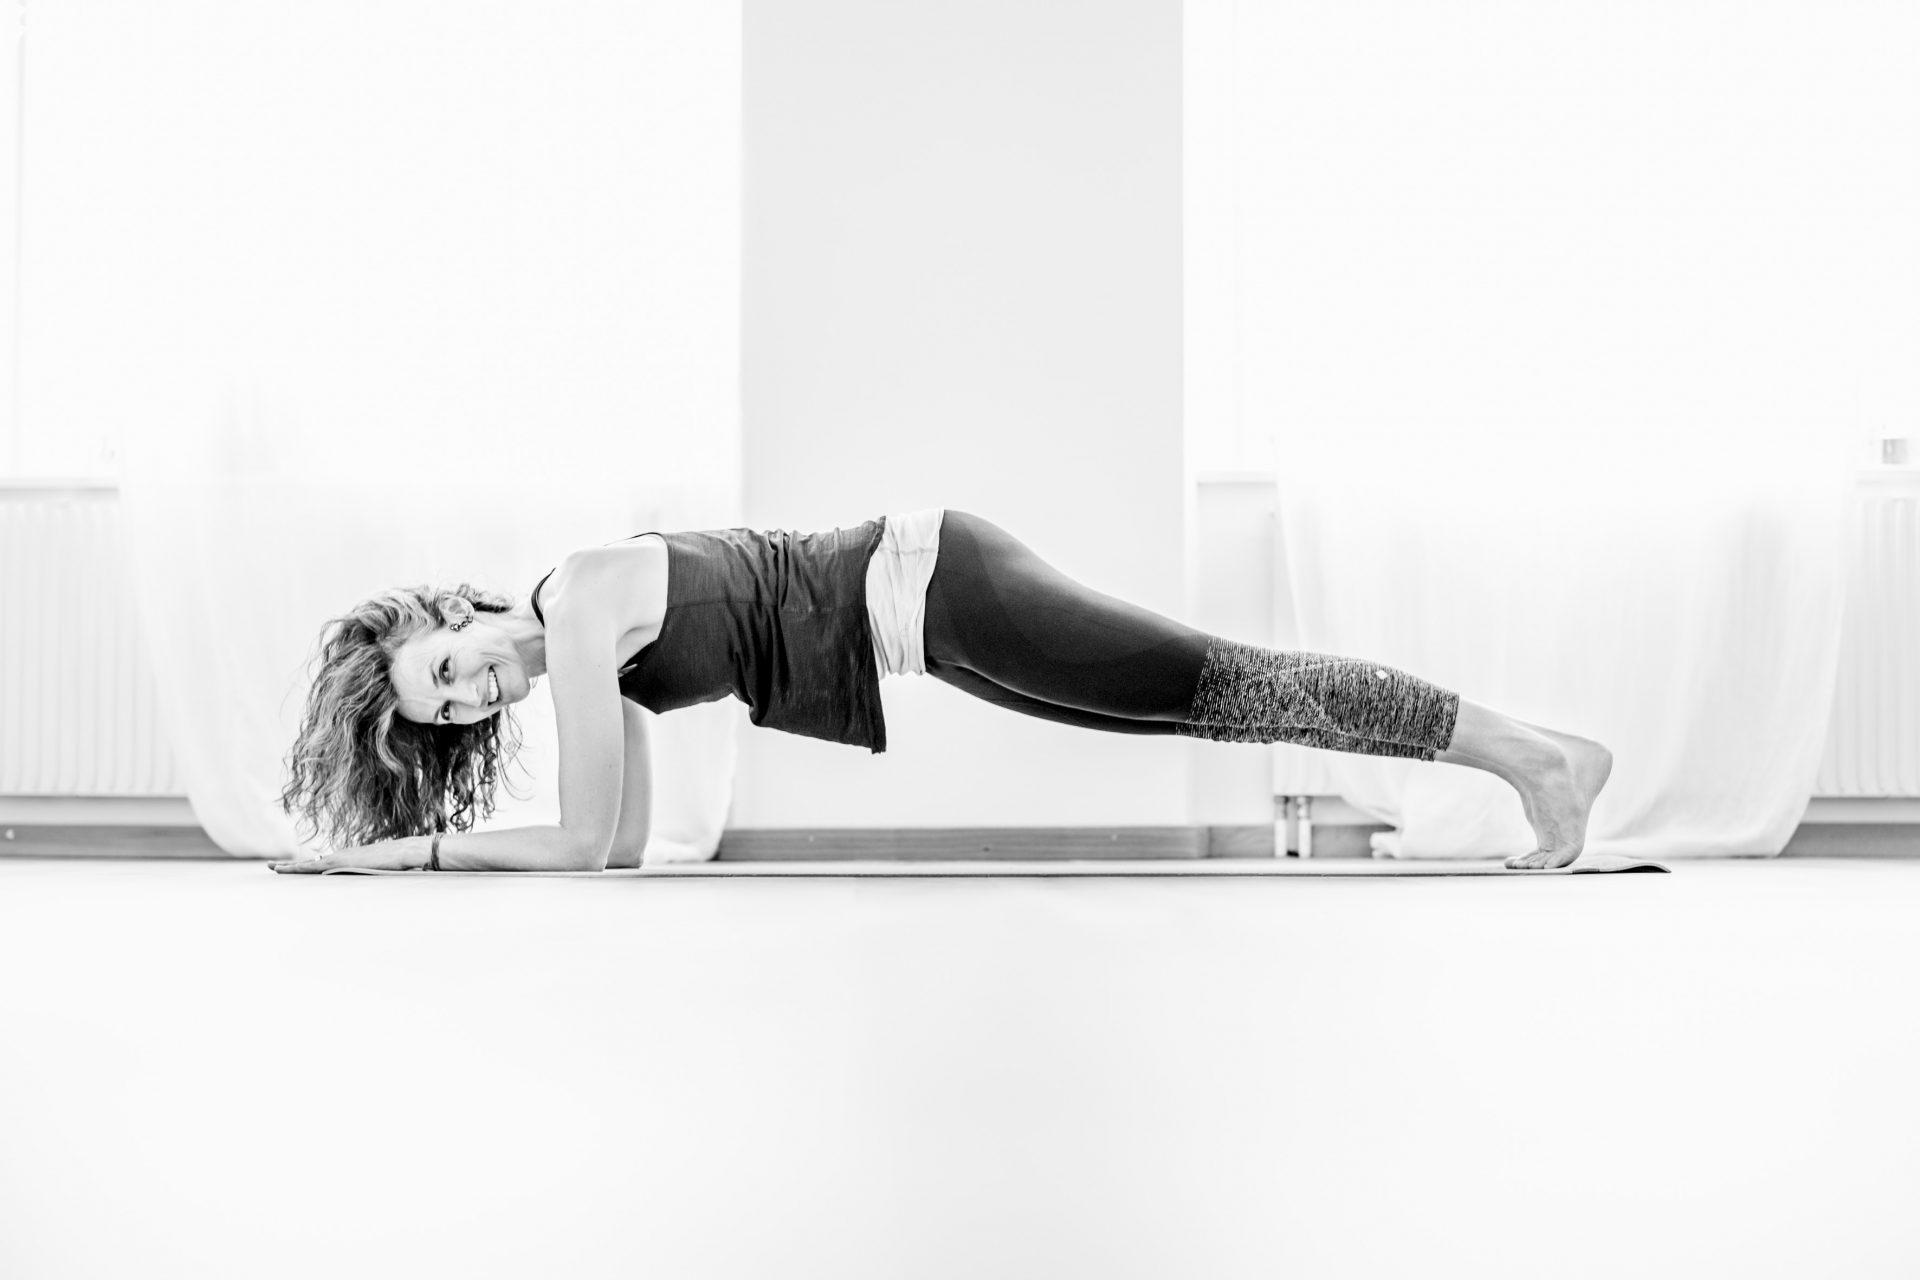 yoga-chur-reichsgasse-raum-fenster-lang3